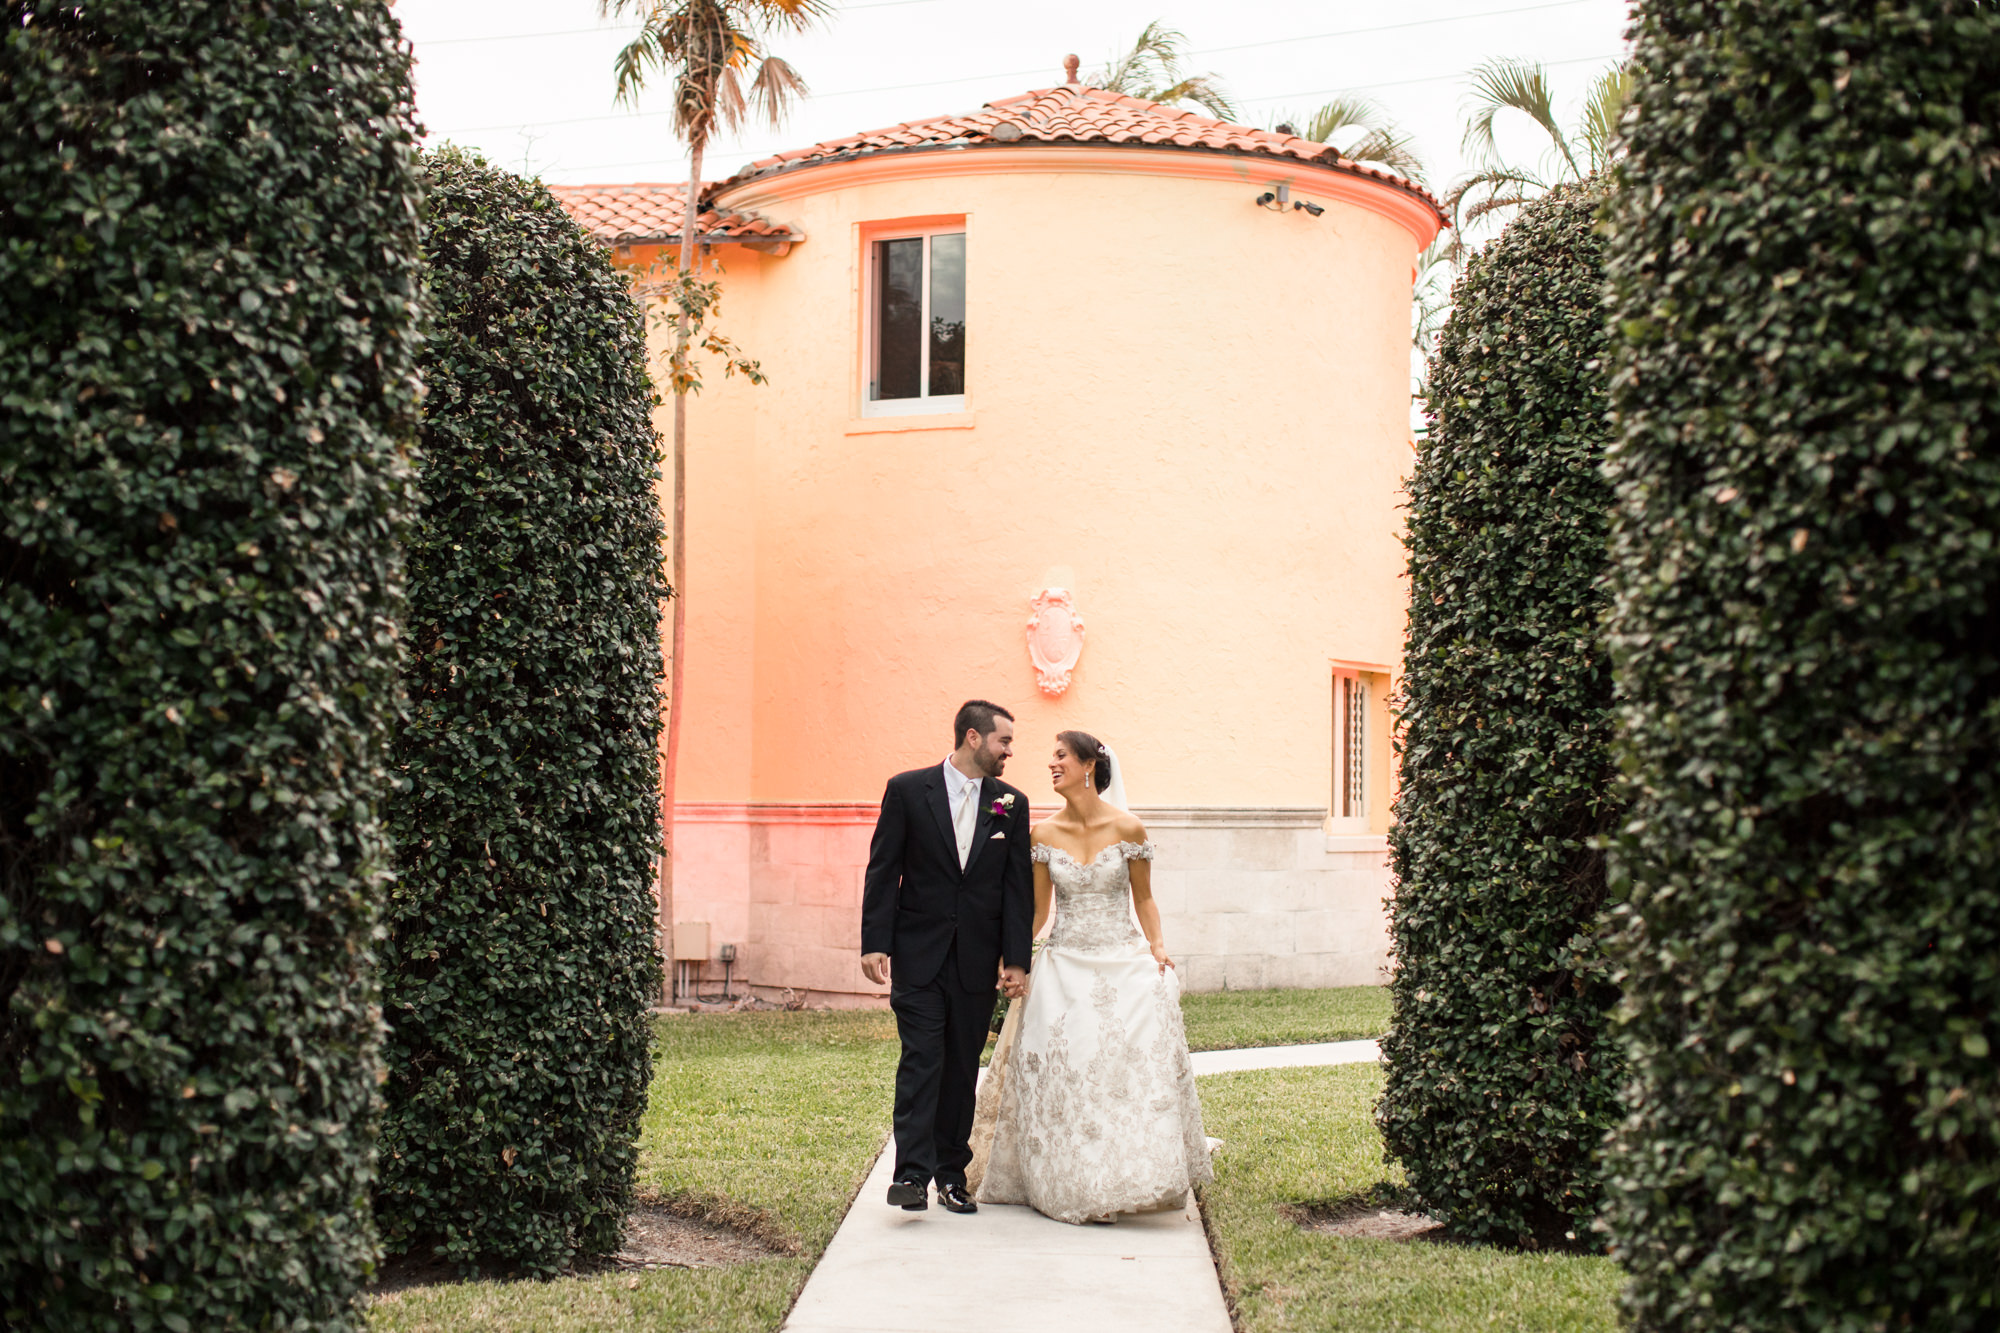 Benvenuto_Wedding_catholic_Florida_Bride-Groom-87.jpg